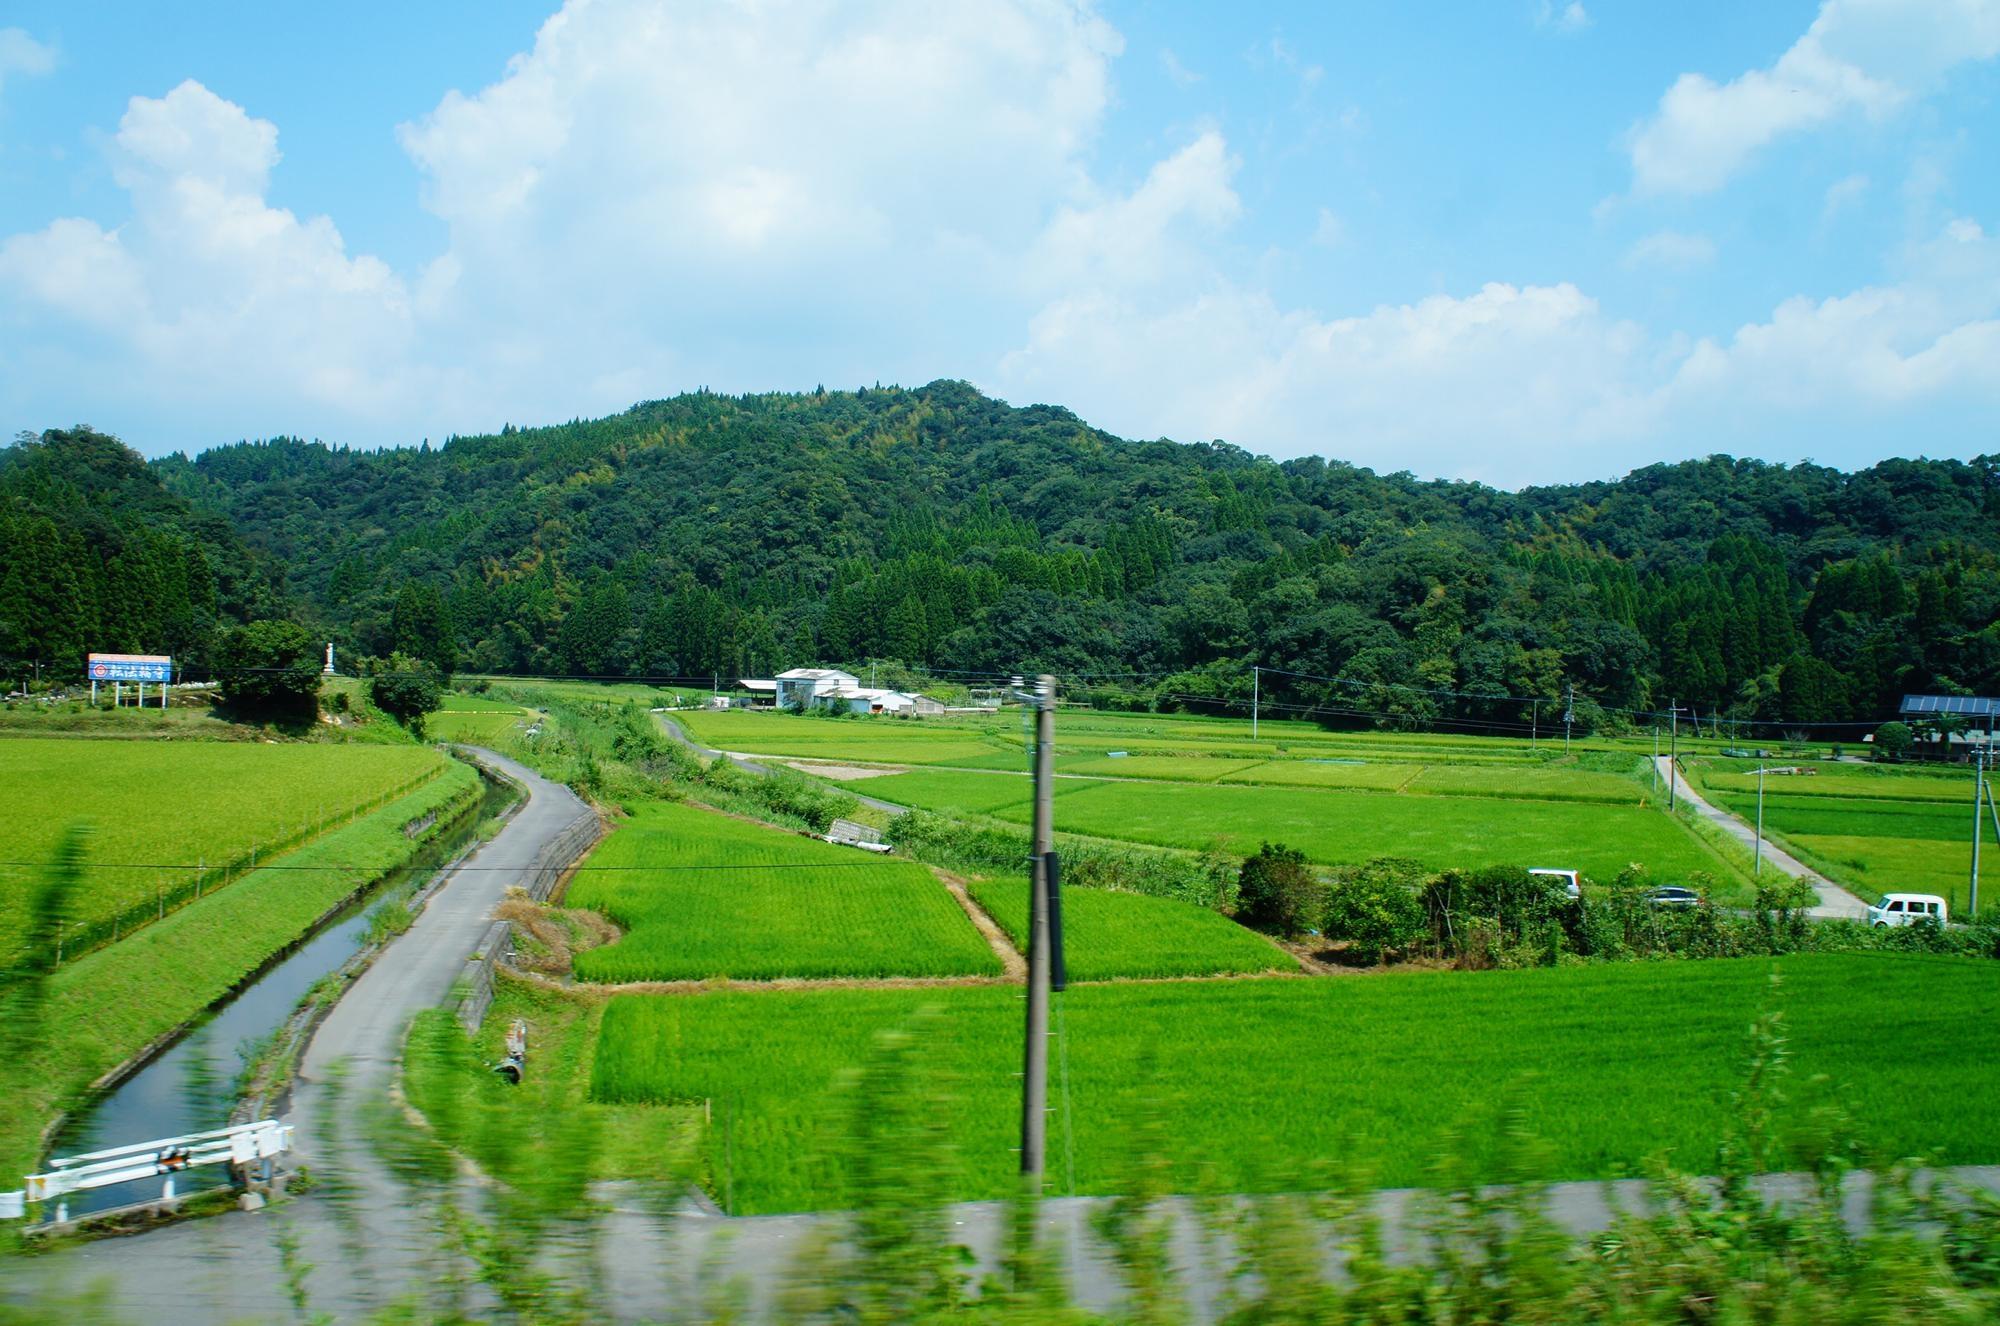 kagoshima_voyage_2015_DSC01289.jpg